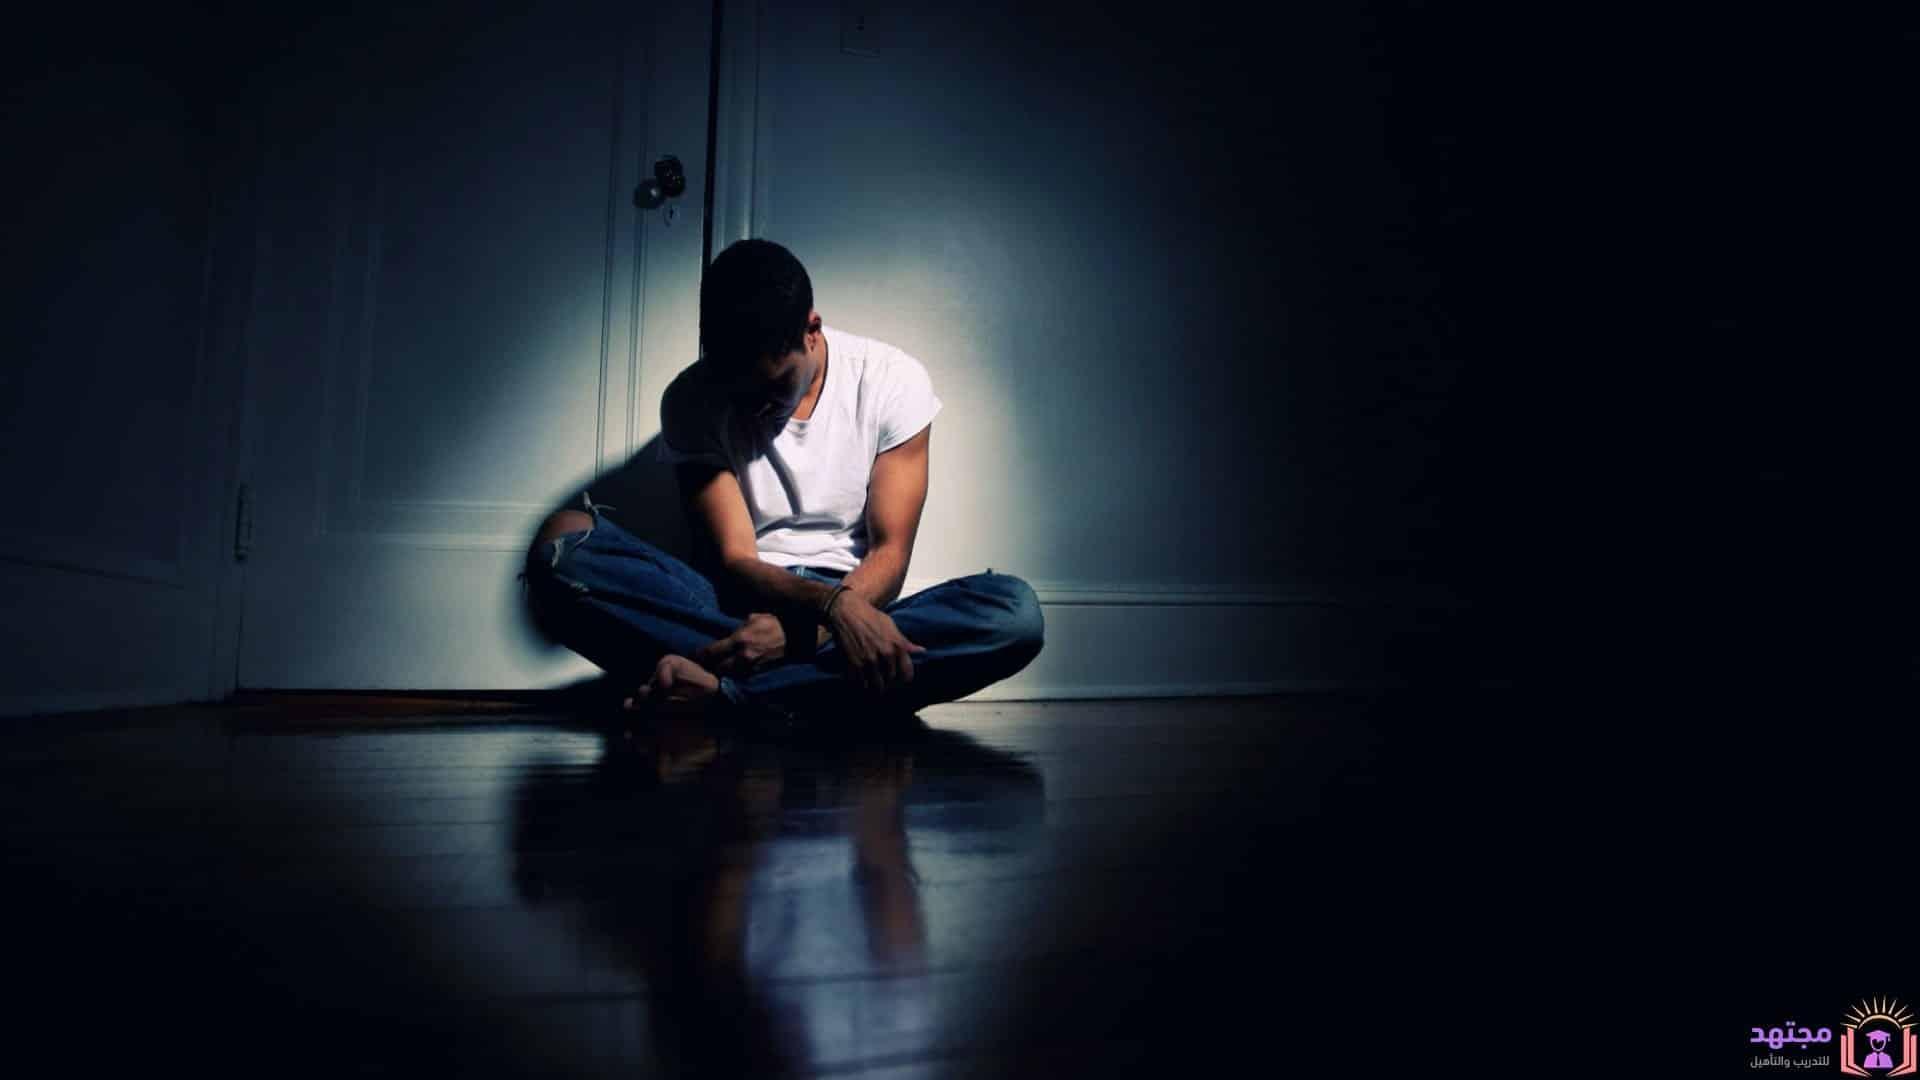 اسباب مرض الاكتئاب